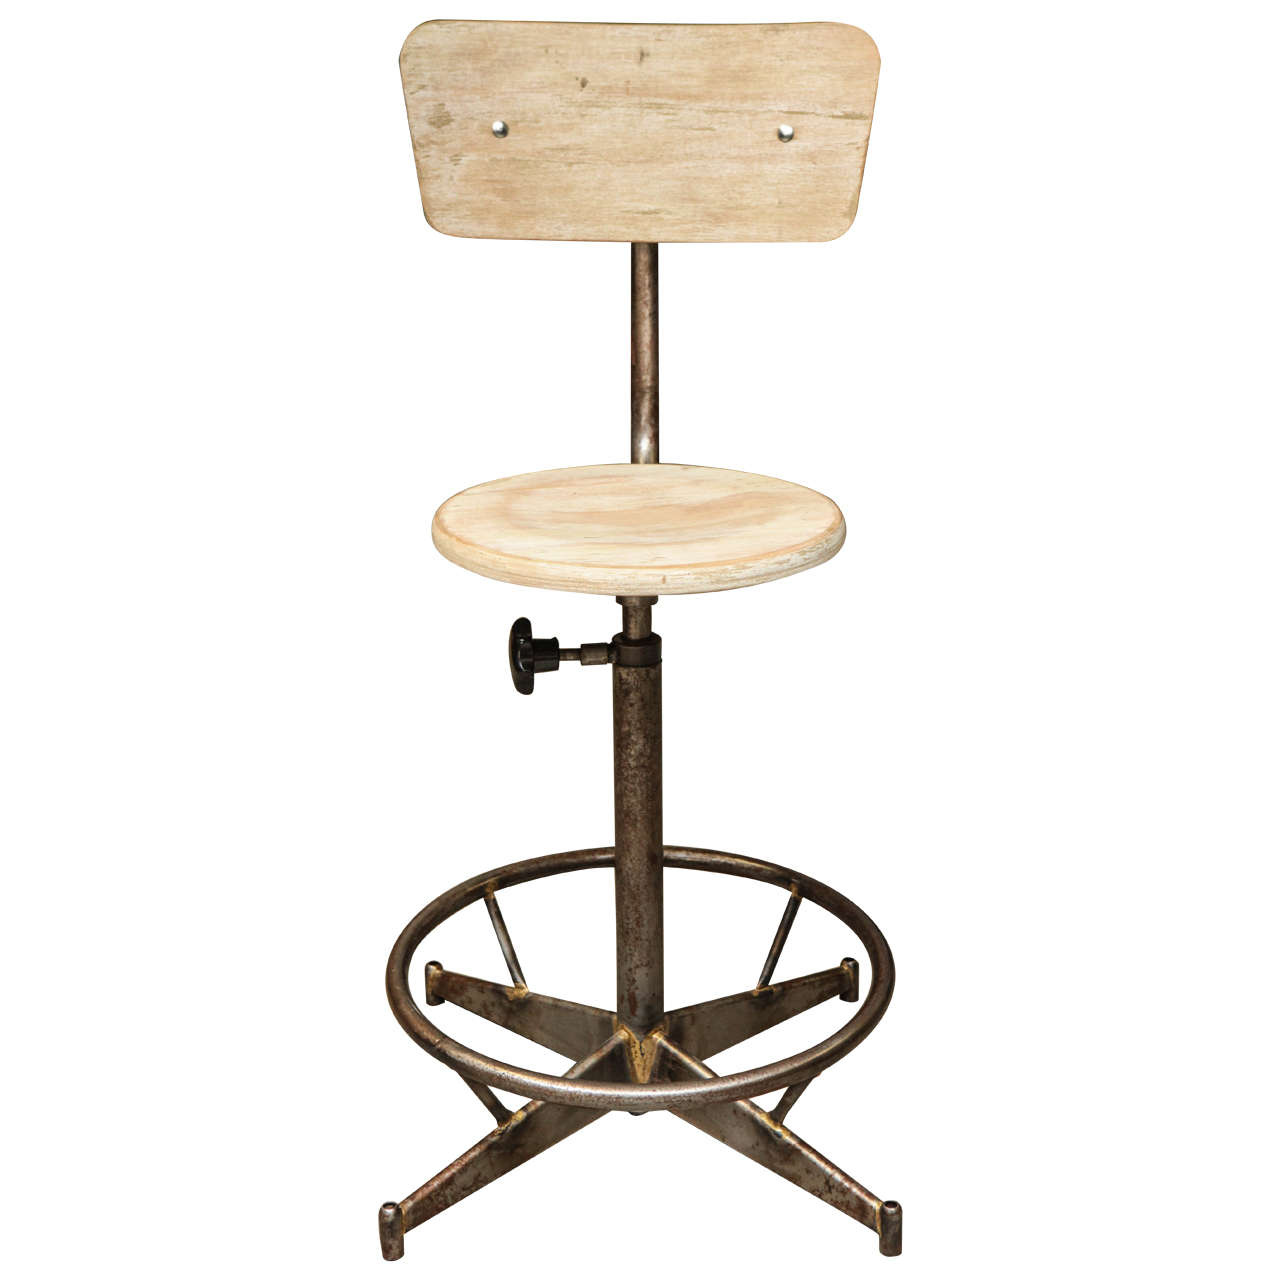 Light Wood And Metal Adjustable Swivel High Chair